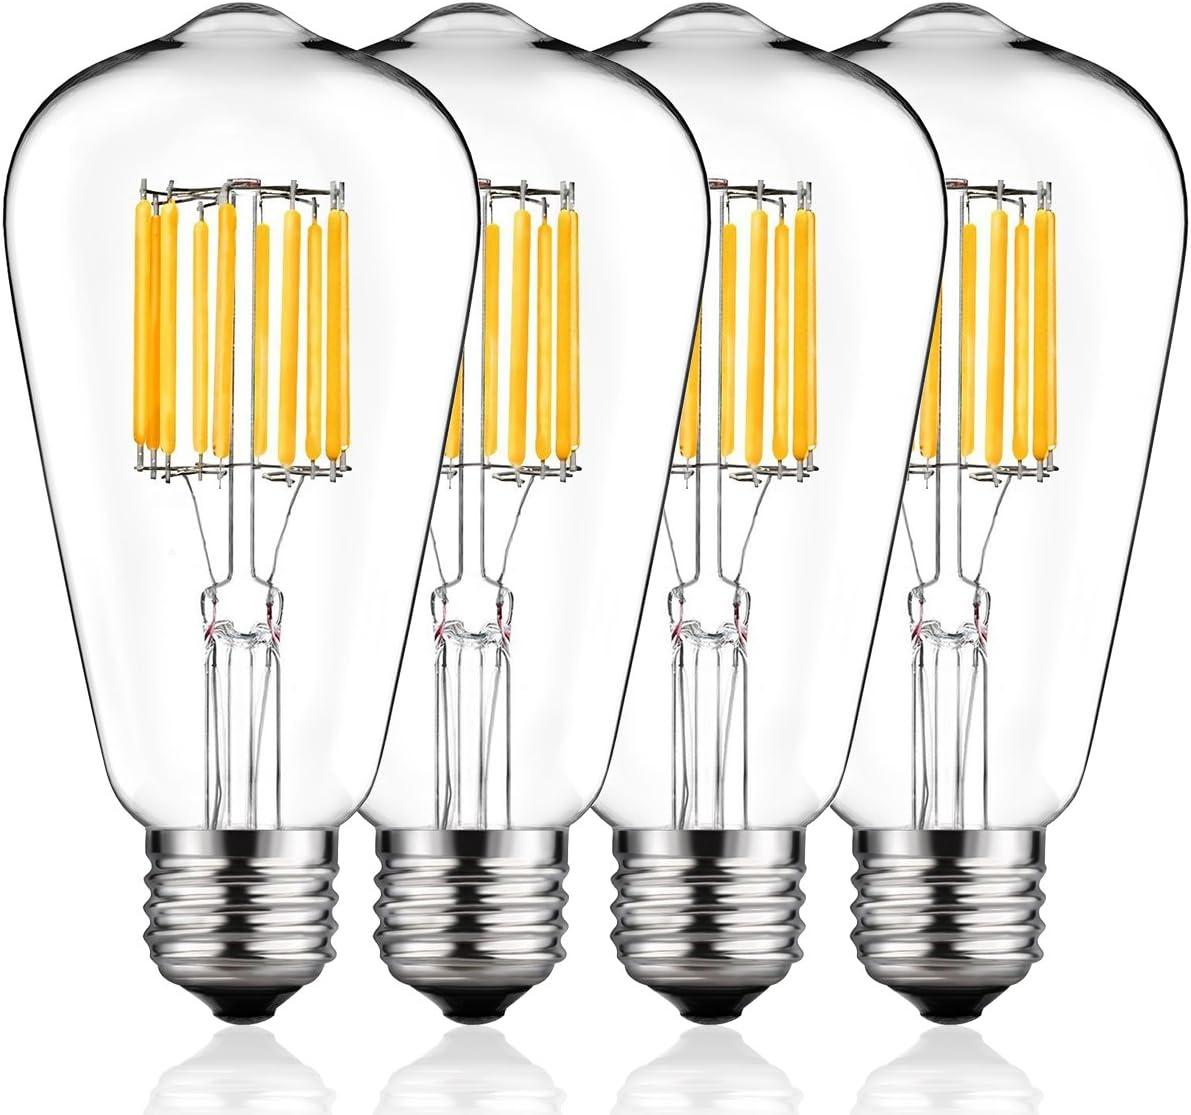 Vintage LED Edison Bulb 100W Equivalent, DORESshop No Dimmable 10W ST64(ST21) Antique LED Filament Light Bulb, Warm White 2700K, E26 Base Squirrel-Cage Antique Lamp for Home Decor, Reading Room, 4Pack